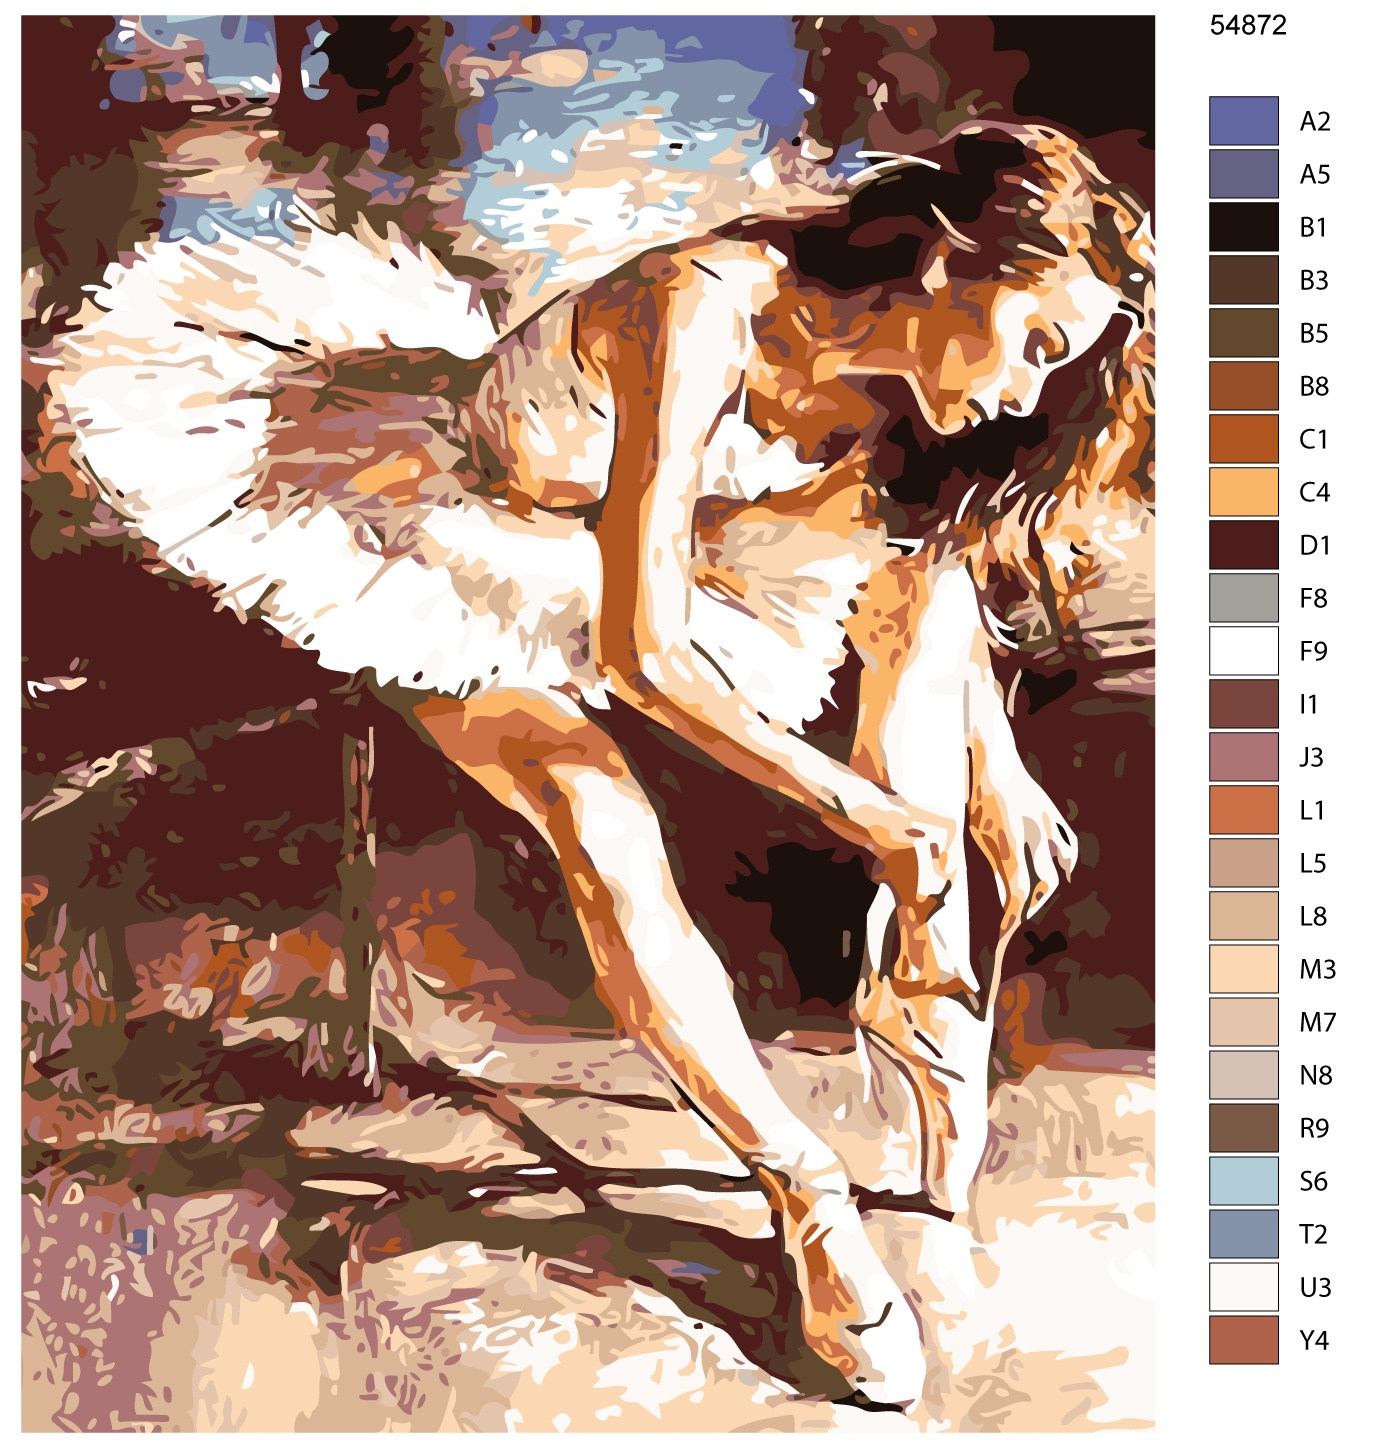 Картина по номерам, 40 x 50 см, KTMK-54872 Живопись по номерам